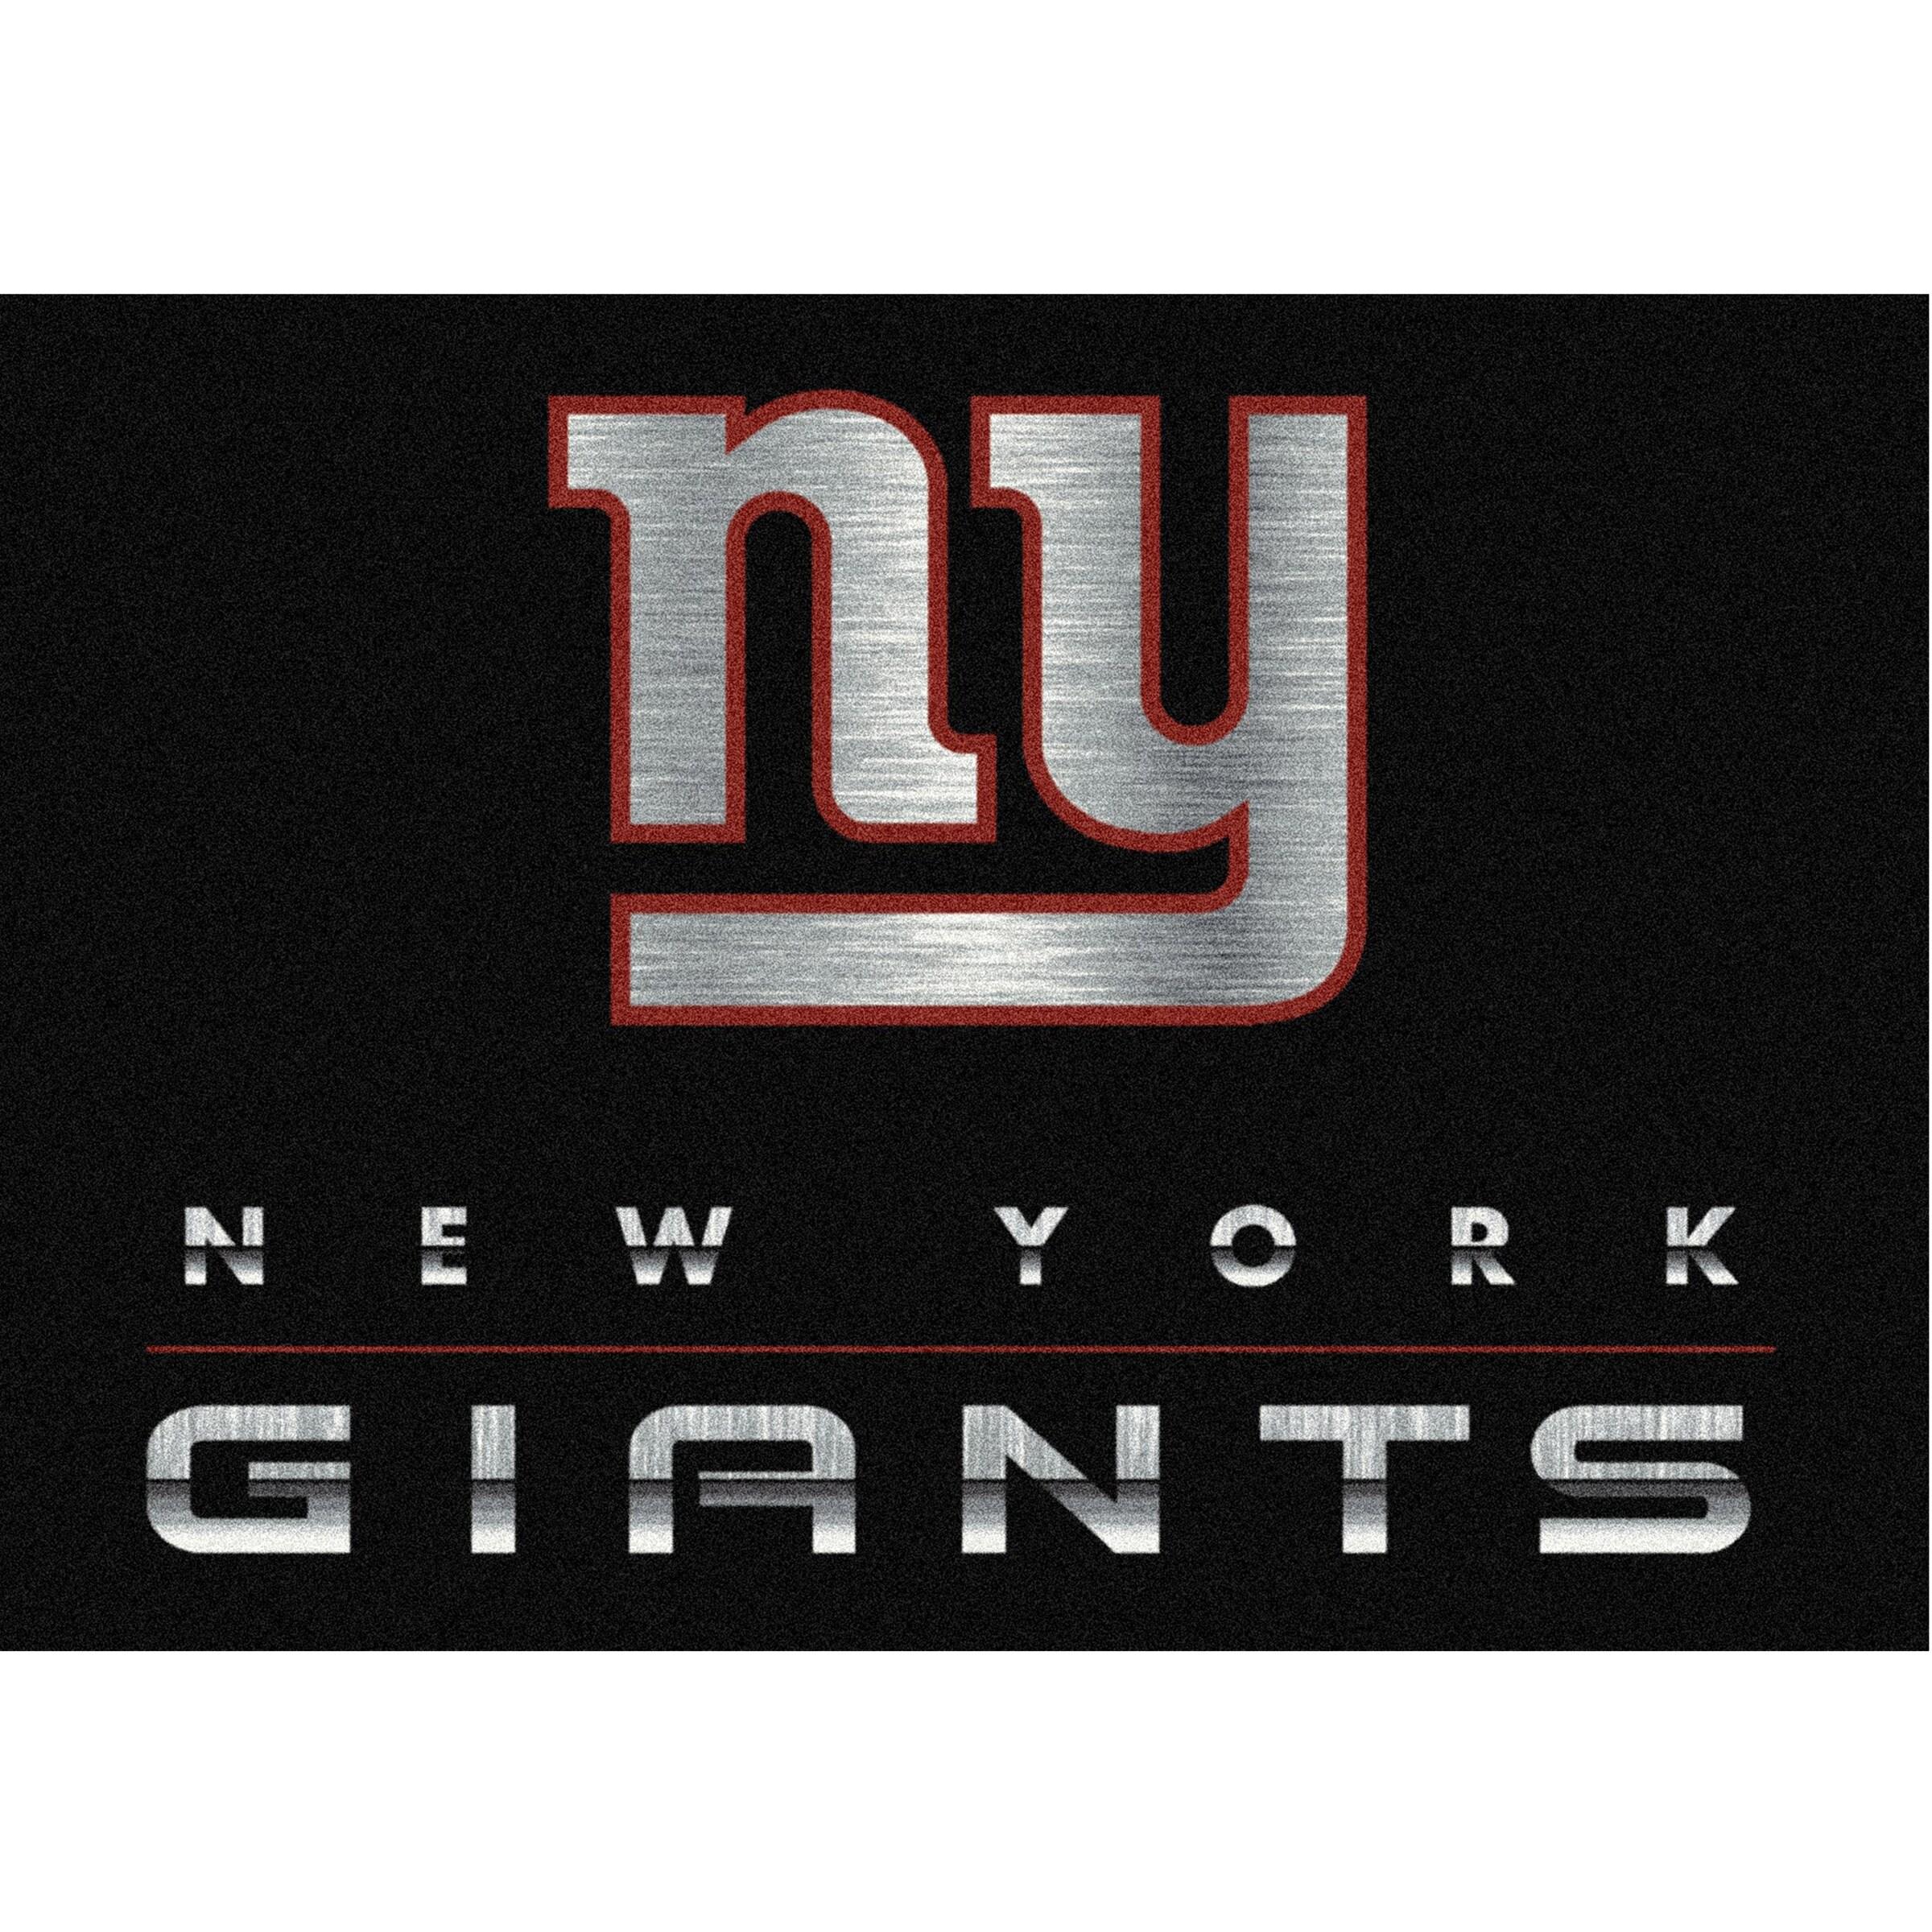 New York Giants Imperial 3'10'' x 5'4'' Chrome Rug